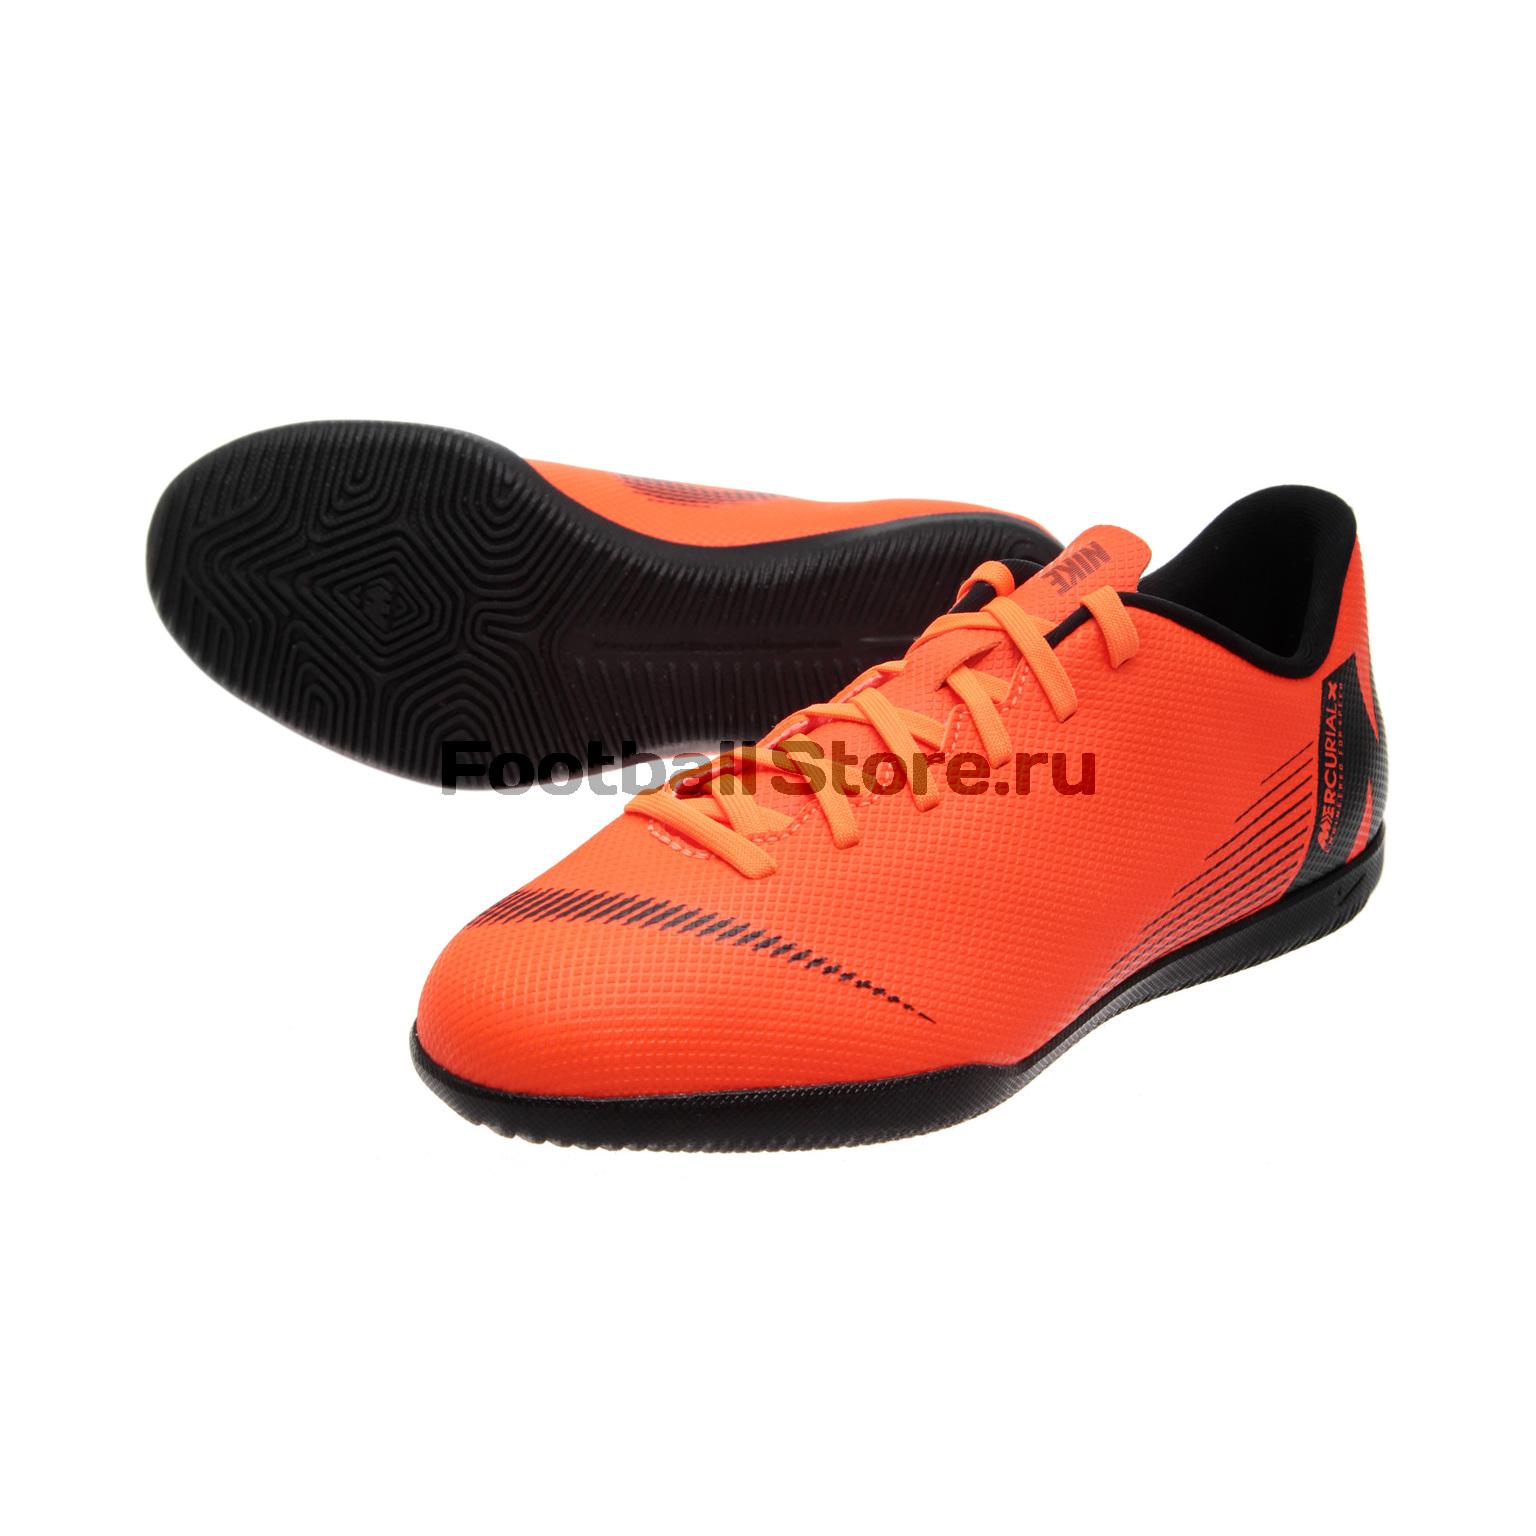 Футзалки детские Nike VaporX 12 Club GS IC AH7354-810 free shipping rt8075zqw rt8075 38 qfn original stock 10pcs lot ic